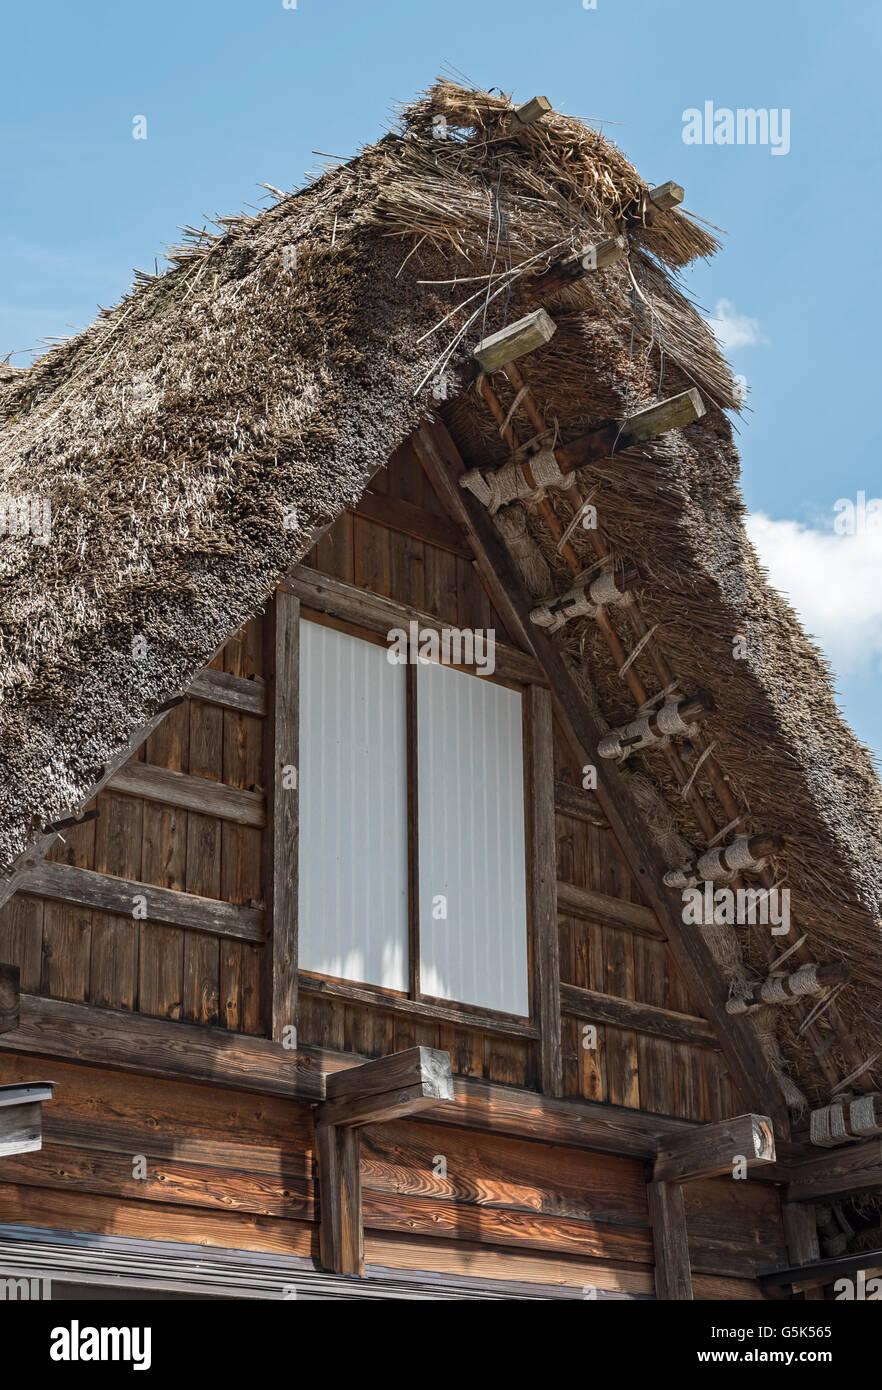 Gassho-zukuri farmhouse roof, Shirakawa, Japan - Stock Image